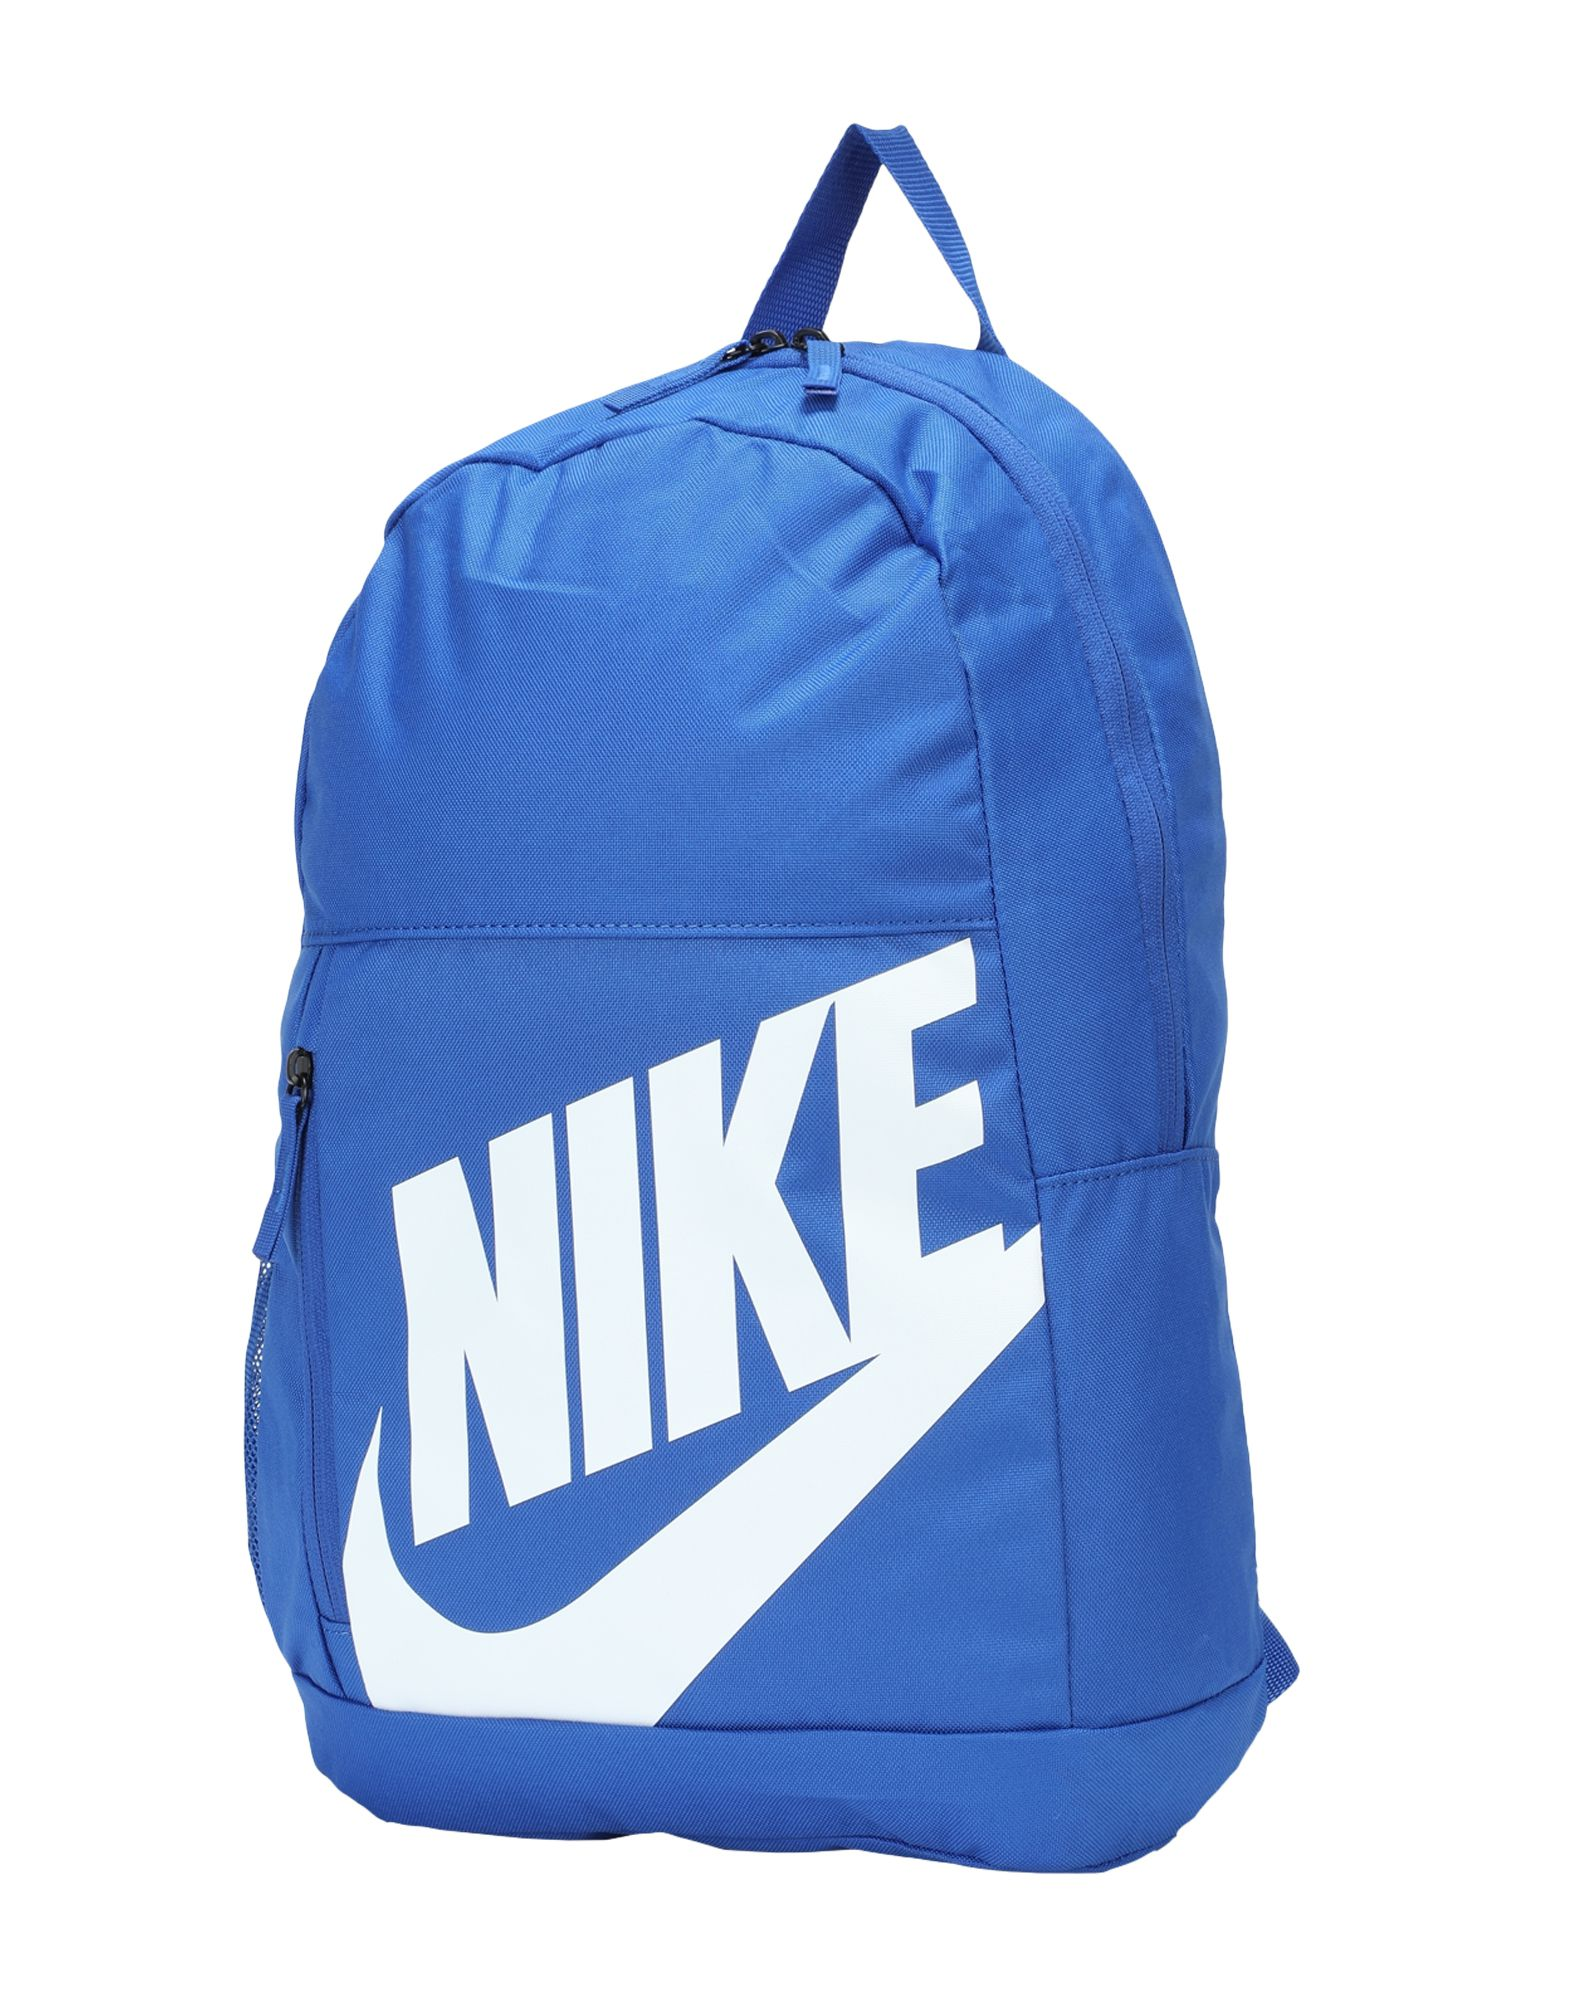 купить NIKE Рюкзаки и сумки на пояс по цене 1890 рублей